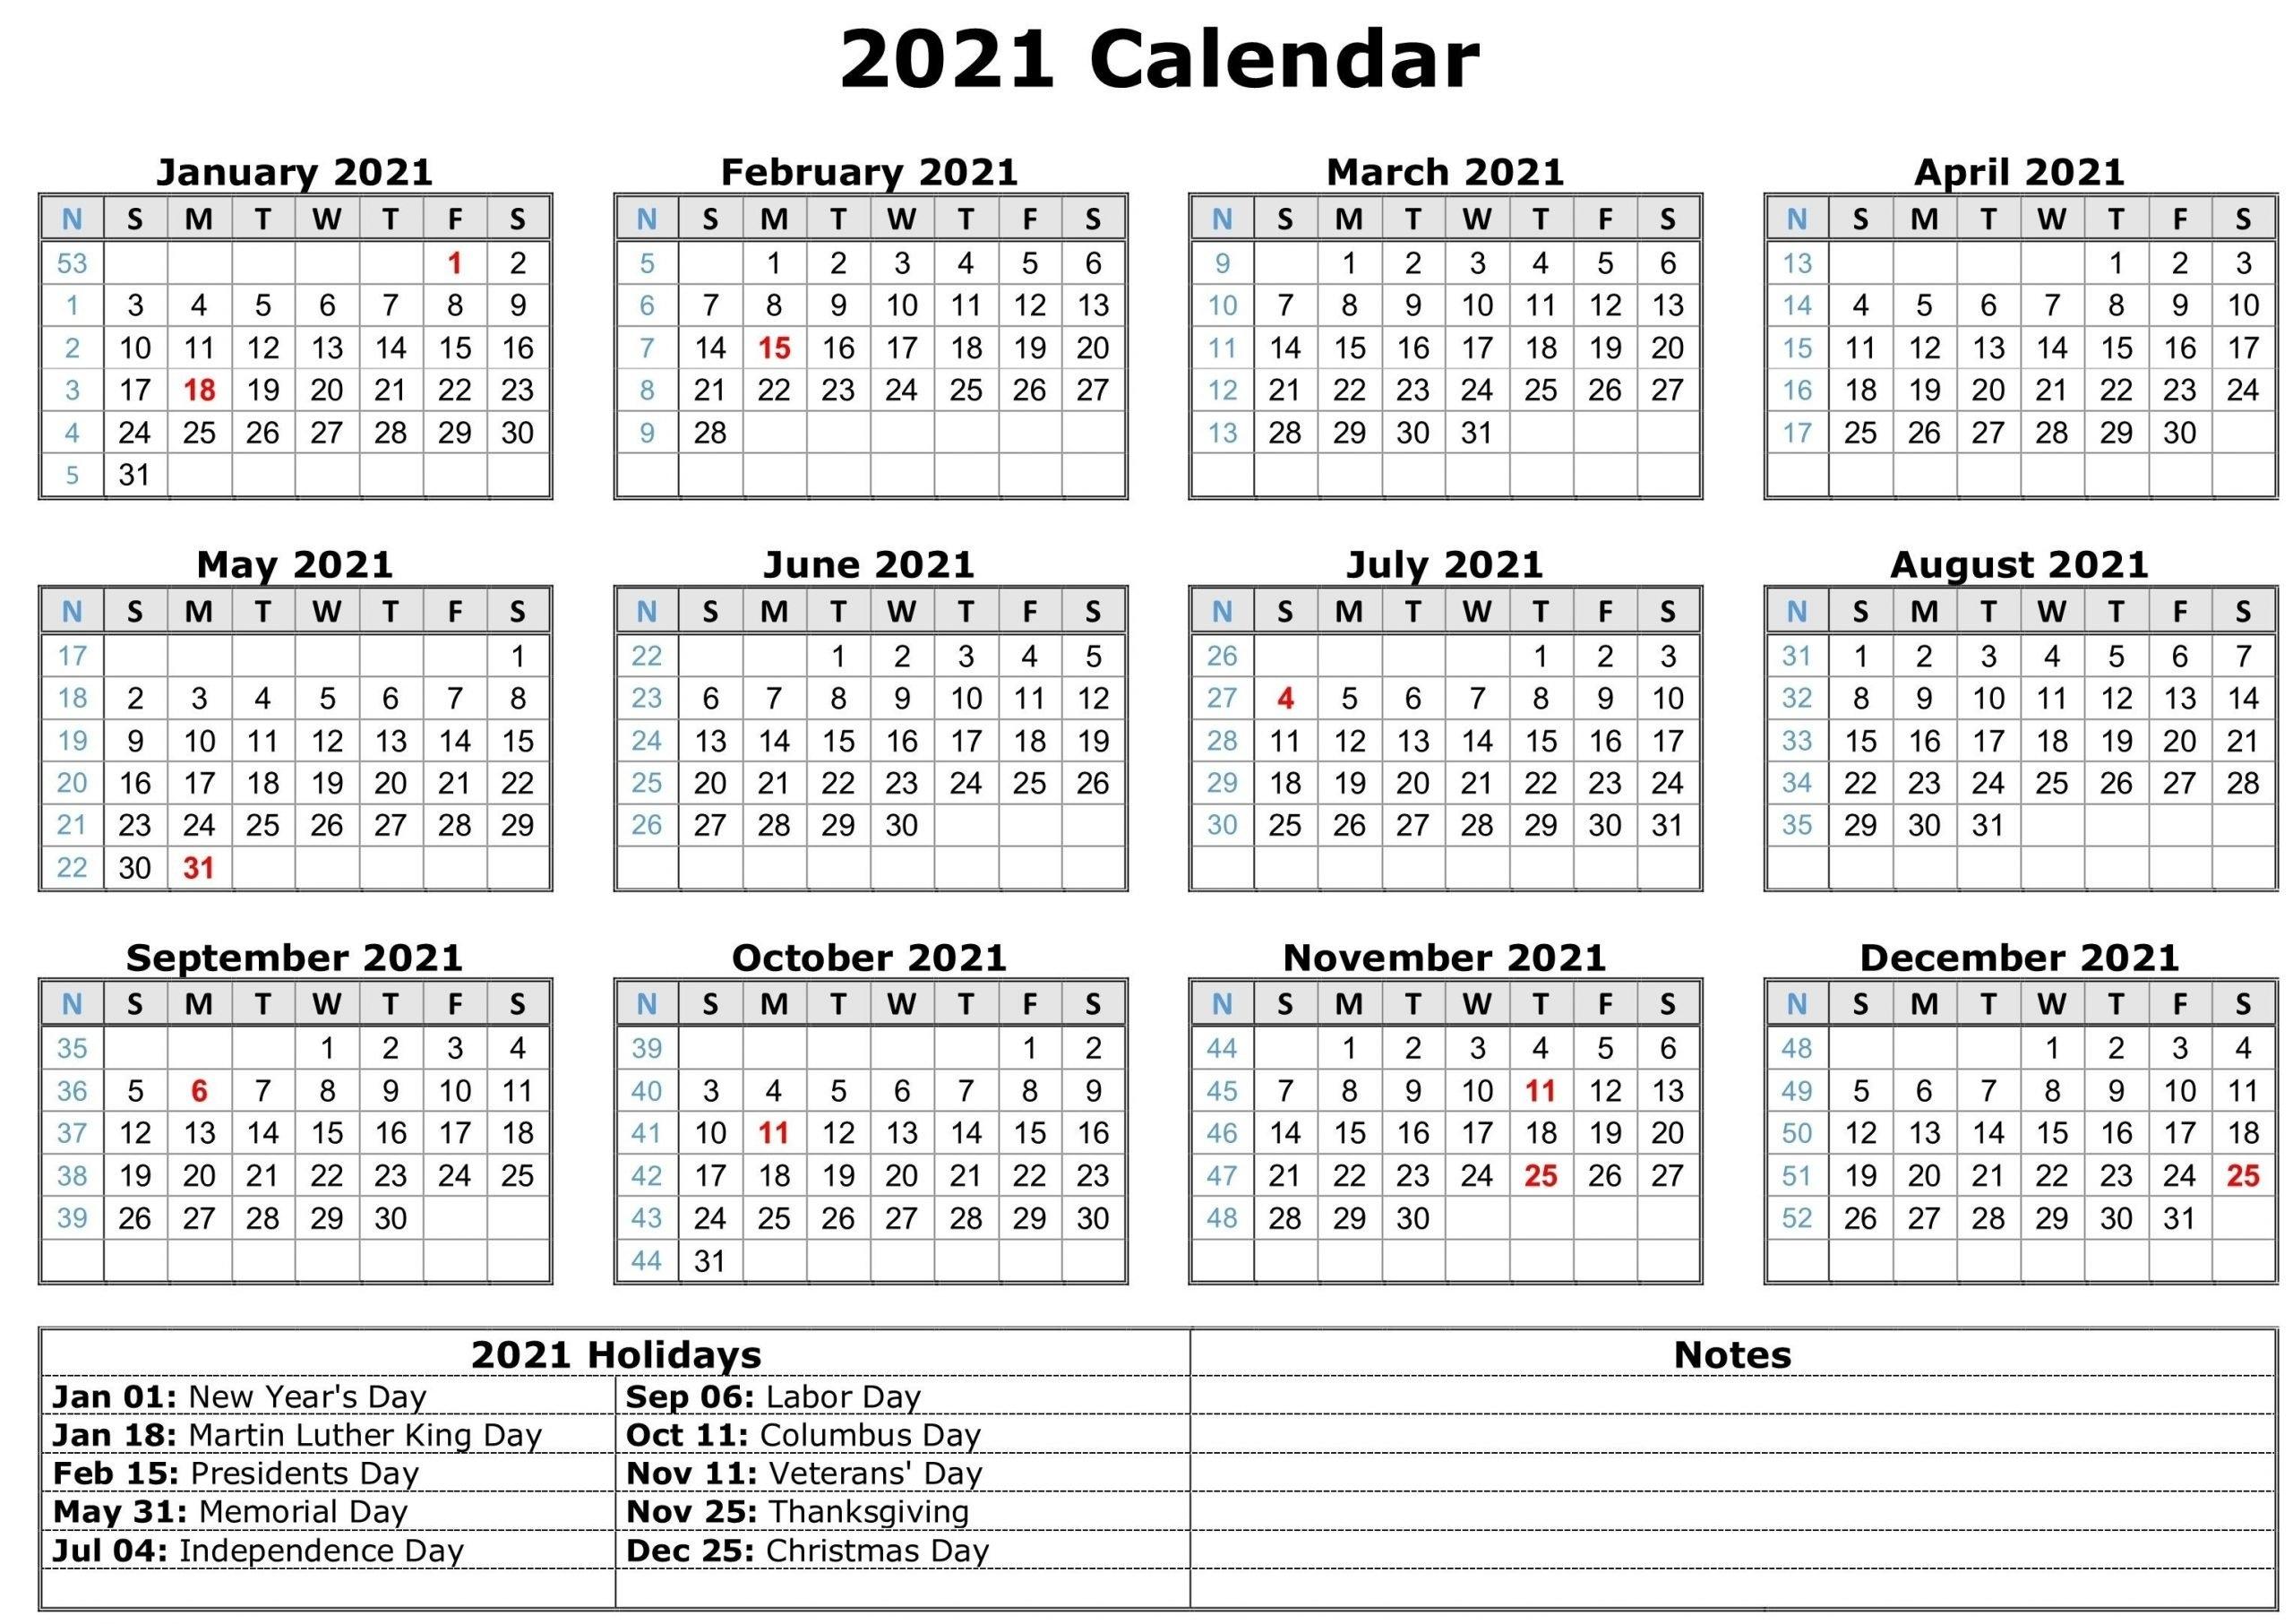 2021 Free Printable Calendar Pdf - Template Calendar Design for Free Printable Planner Pdf 2021